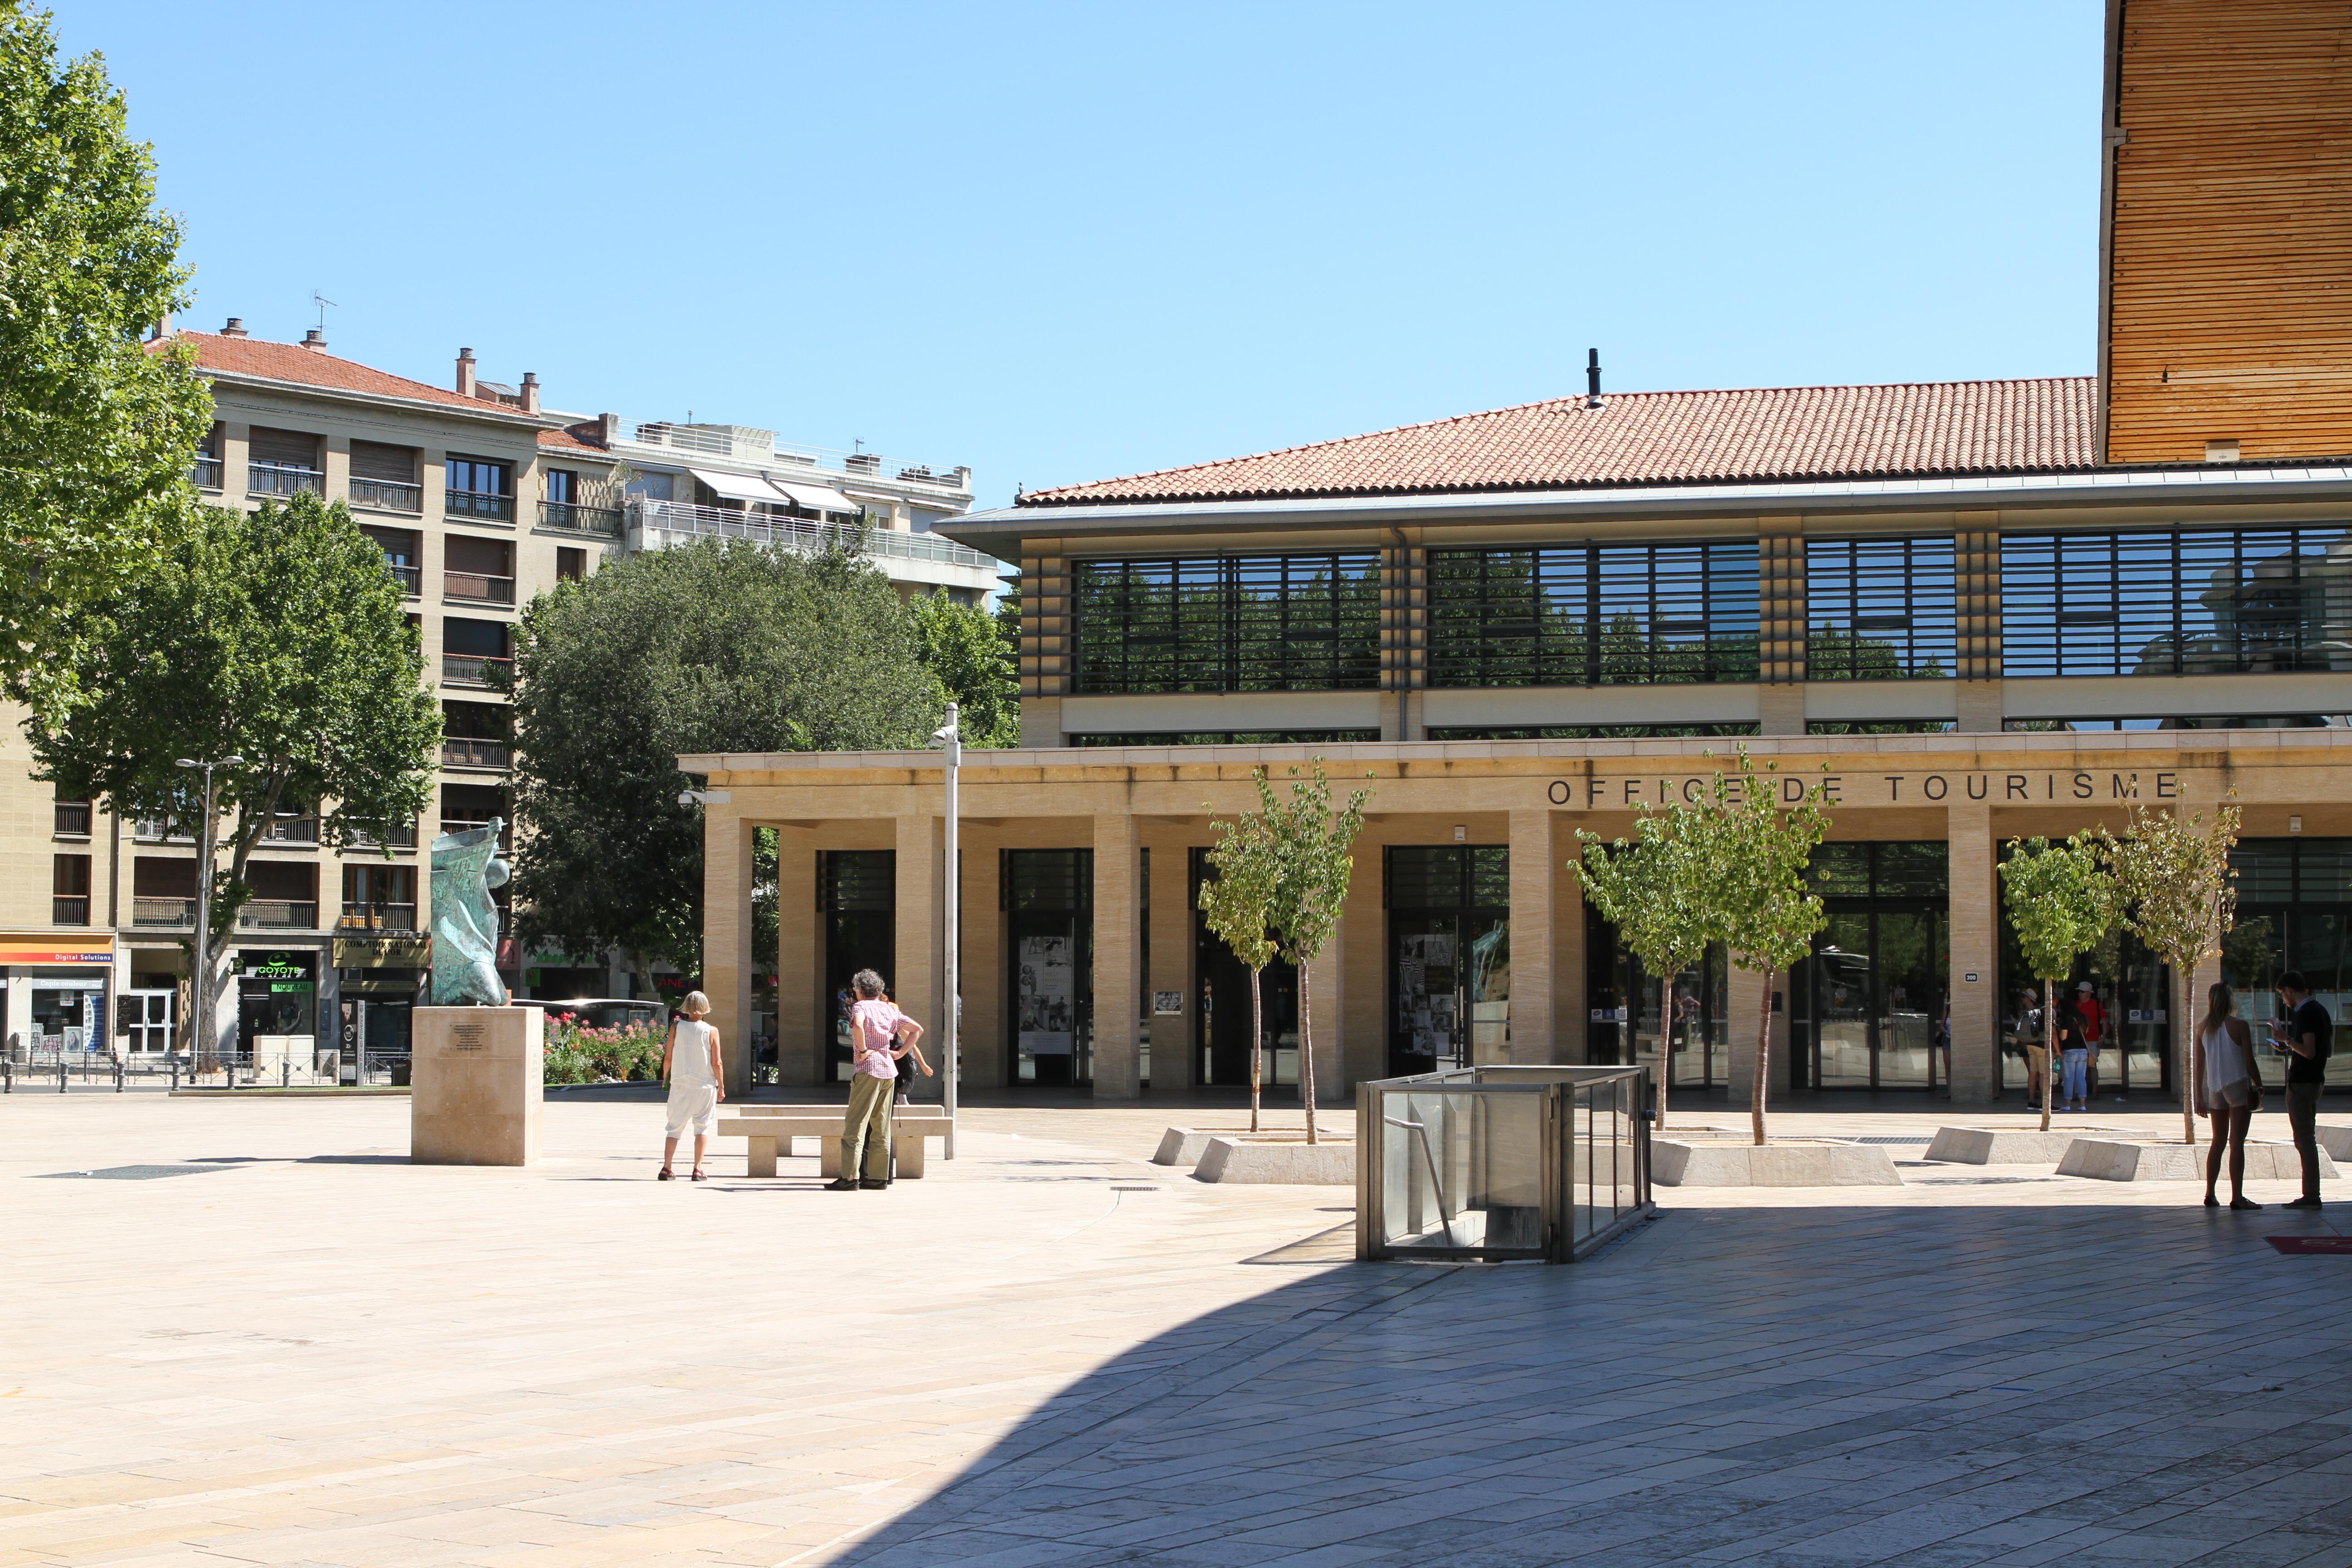 Couleurs Facades En Provence file:aix-en-provence 20160717 21 - wikimedia commons